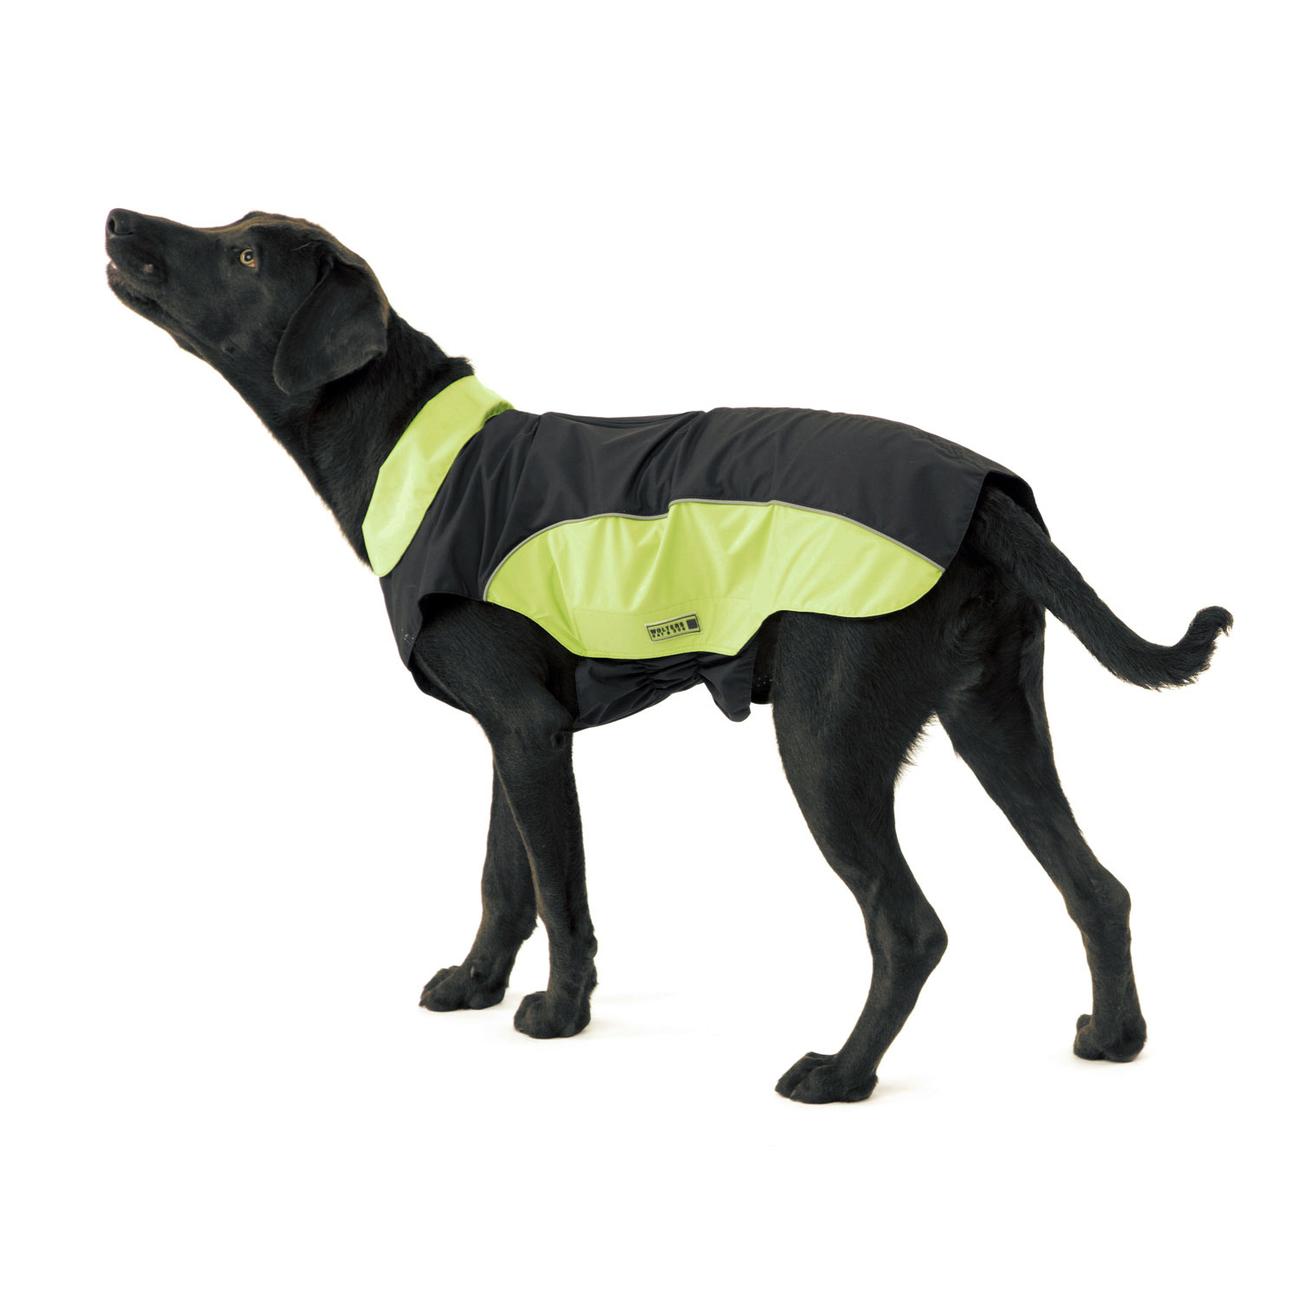 Wolters WOLTERS Regenjacke für Hunde Easy Rain, Bild 16